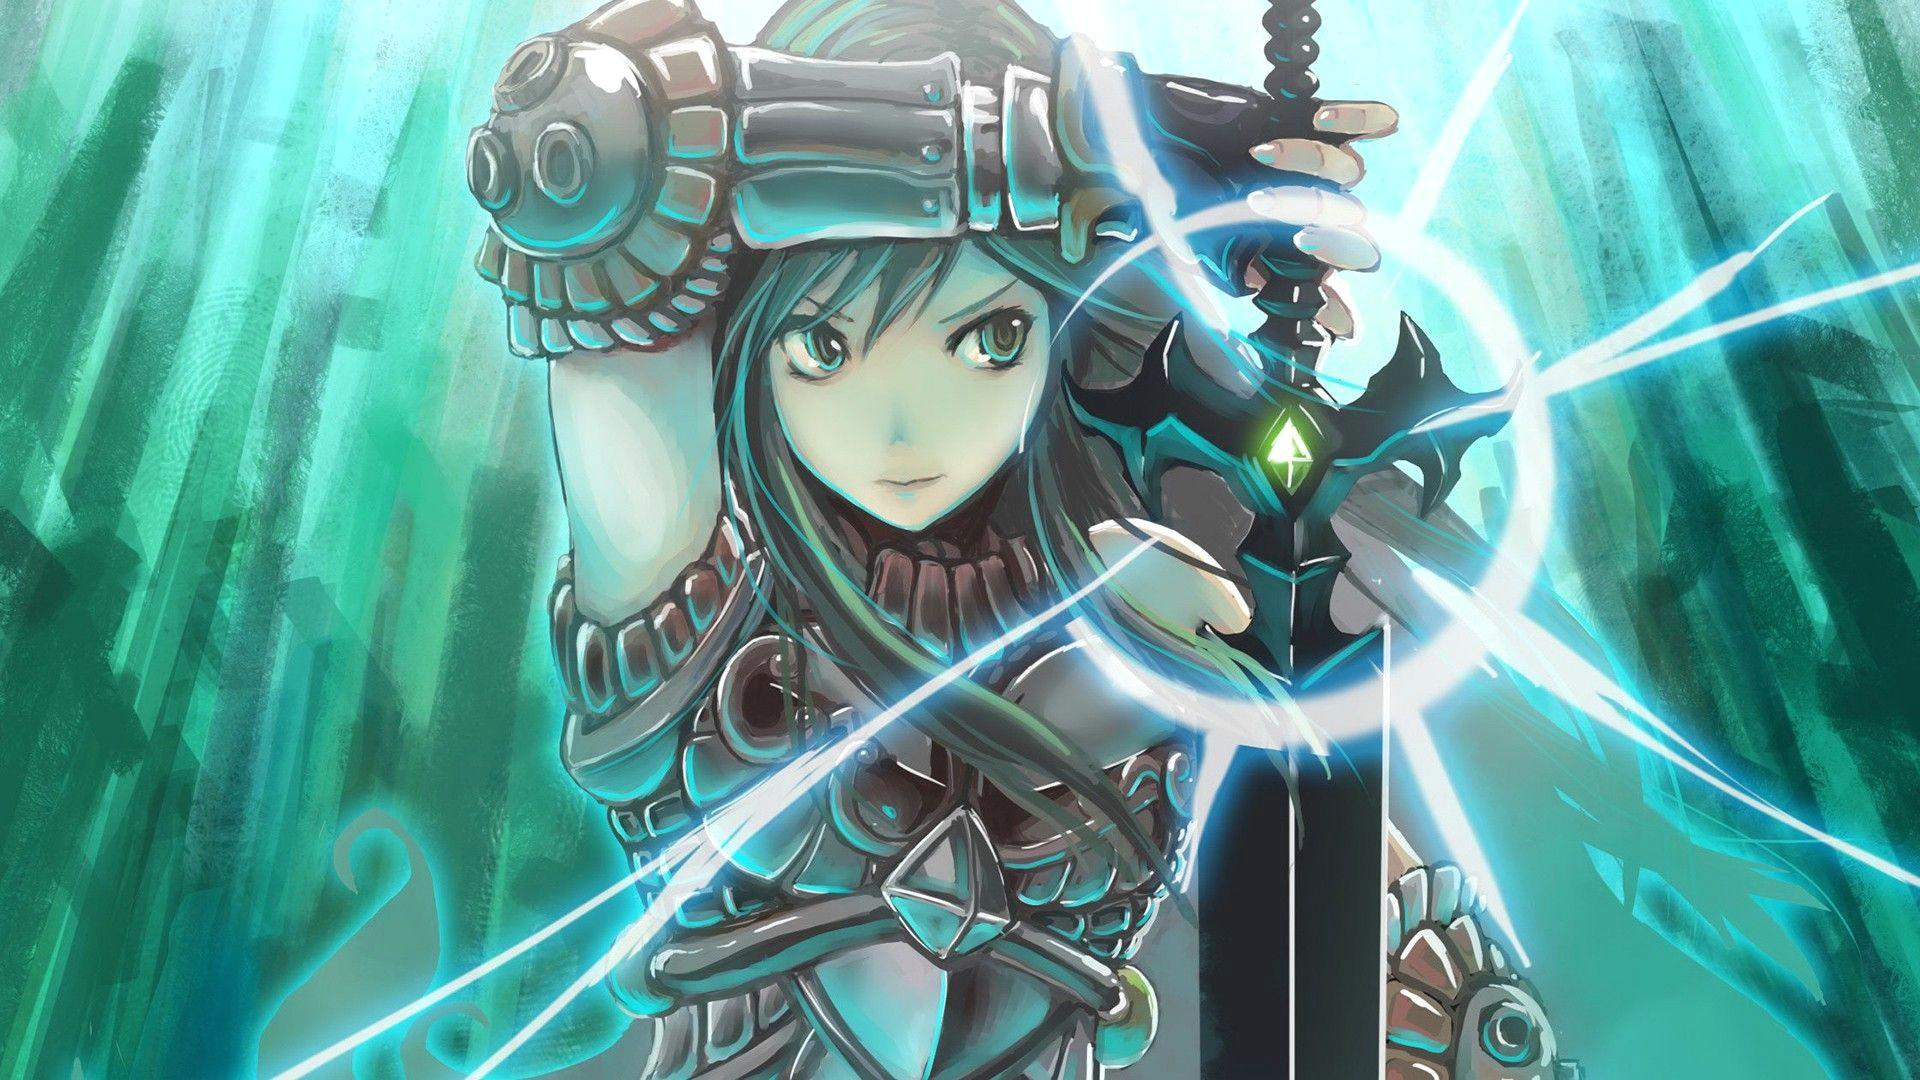 anime 1920x1080 anime fantasy art anime girls sword armor original characters